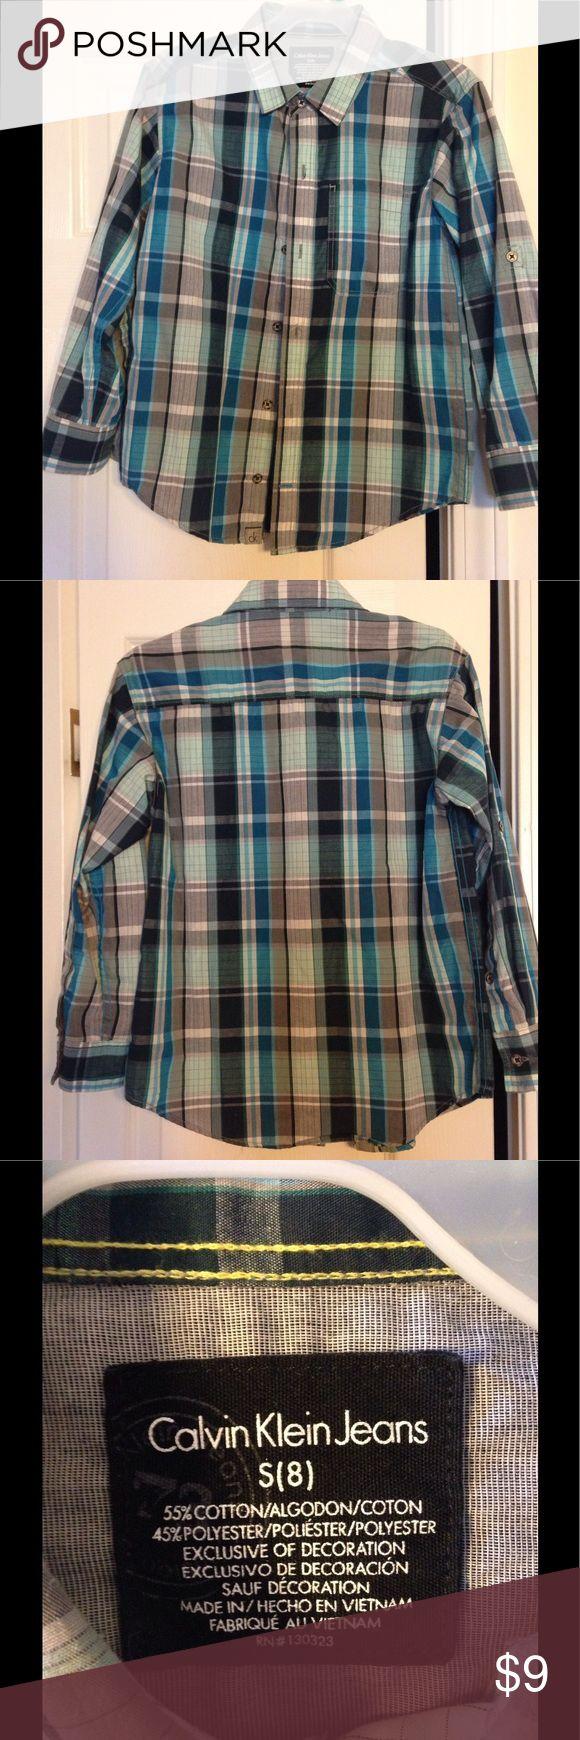 EUC Calvin Klein Jeans Plaid Boys Shirt Size 8 EUC Calvin Klein Jeans Plaid Boys Button Up Shirt. Size 8. 55% Cotton 45% Polyester Calvin Klein Jeans Shirts & Tops Button Down Shirts